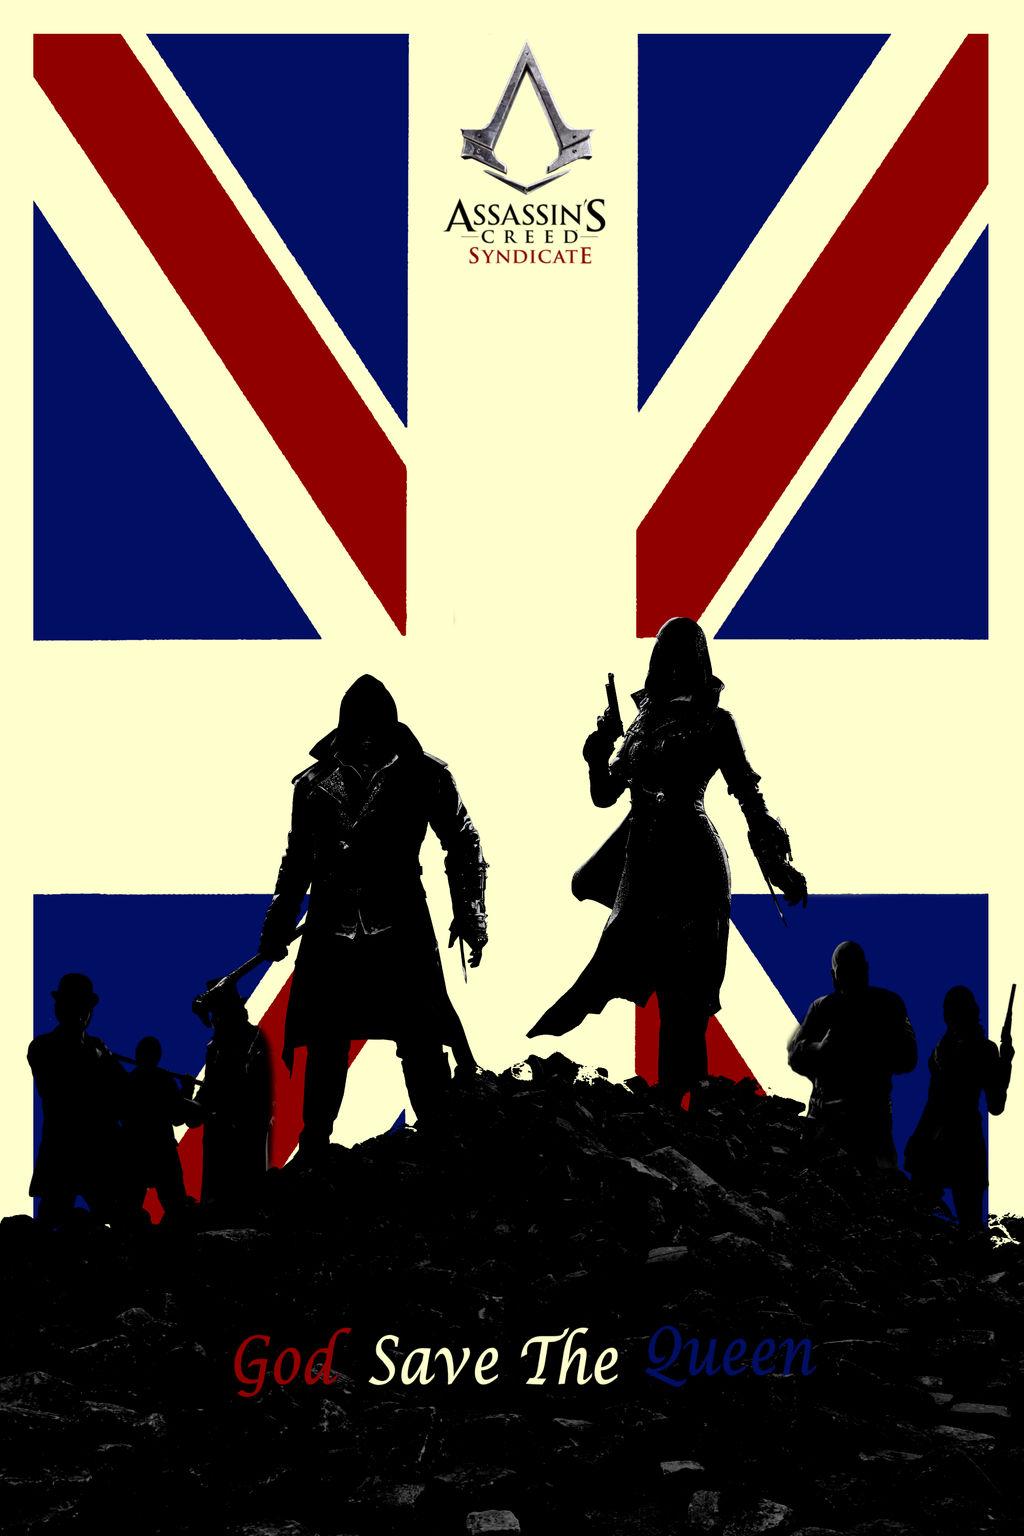 Assassin S Creed Syndicate Minimalist Poster By Raidriar93 On Deviantart